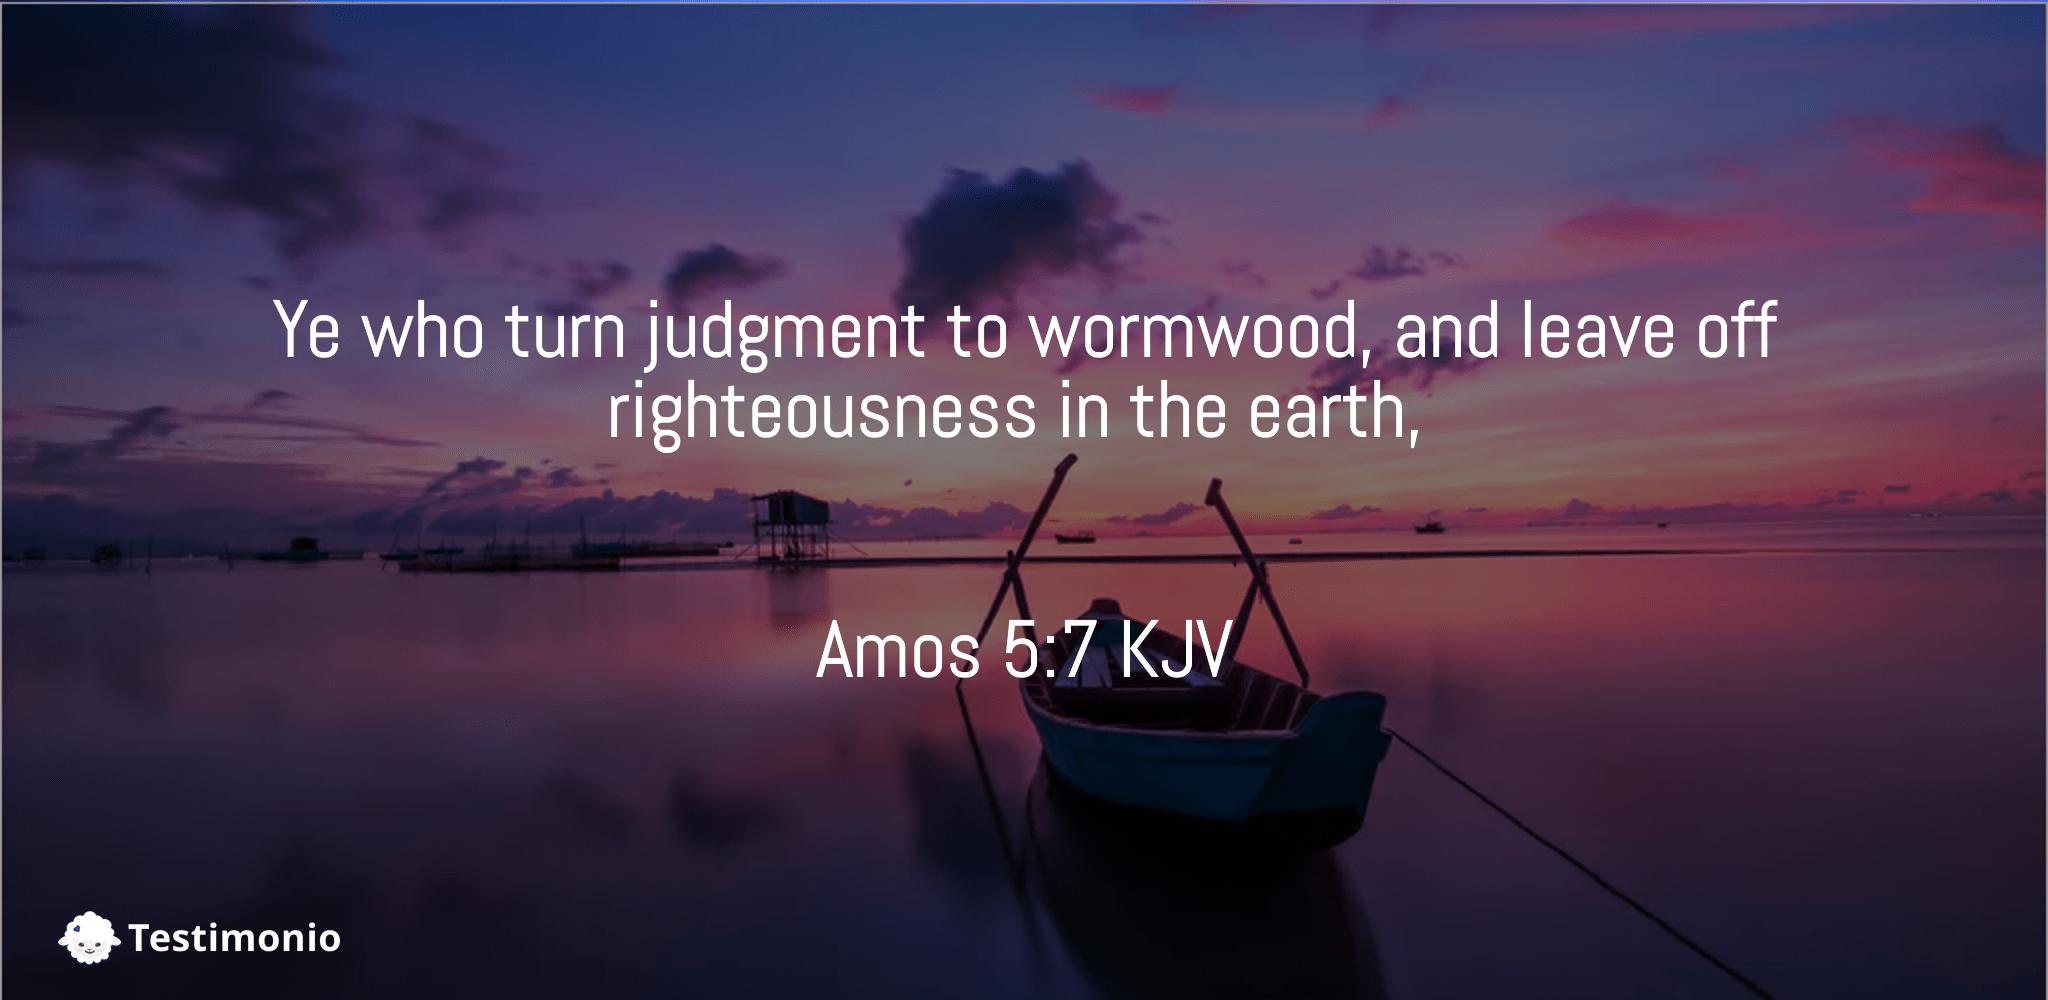 Amos 5:7